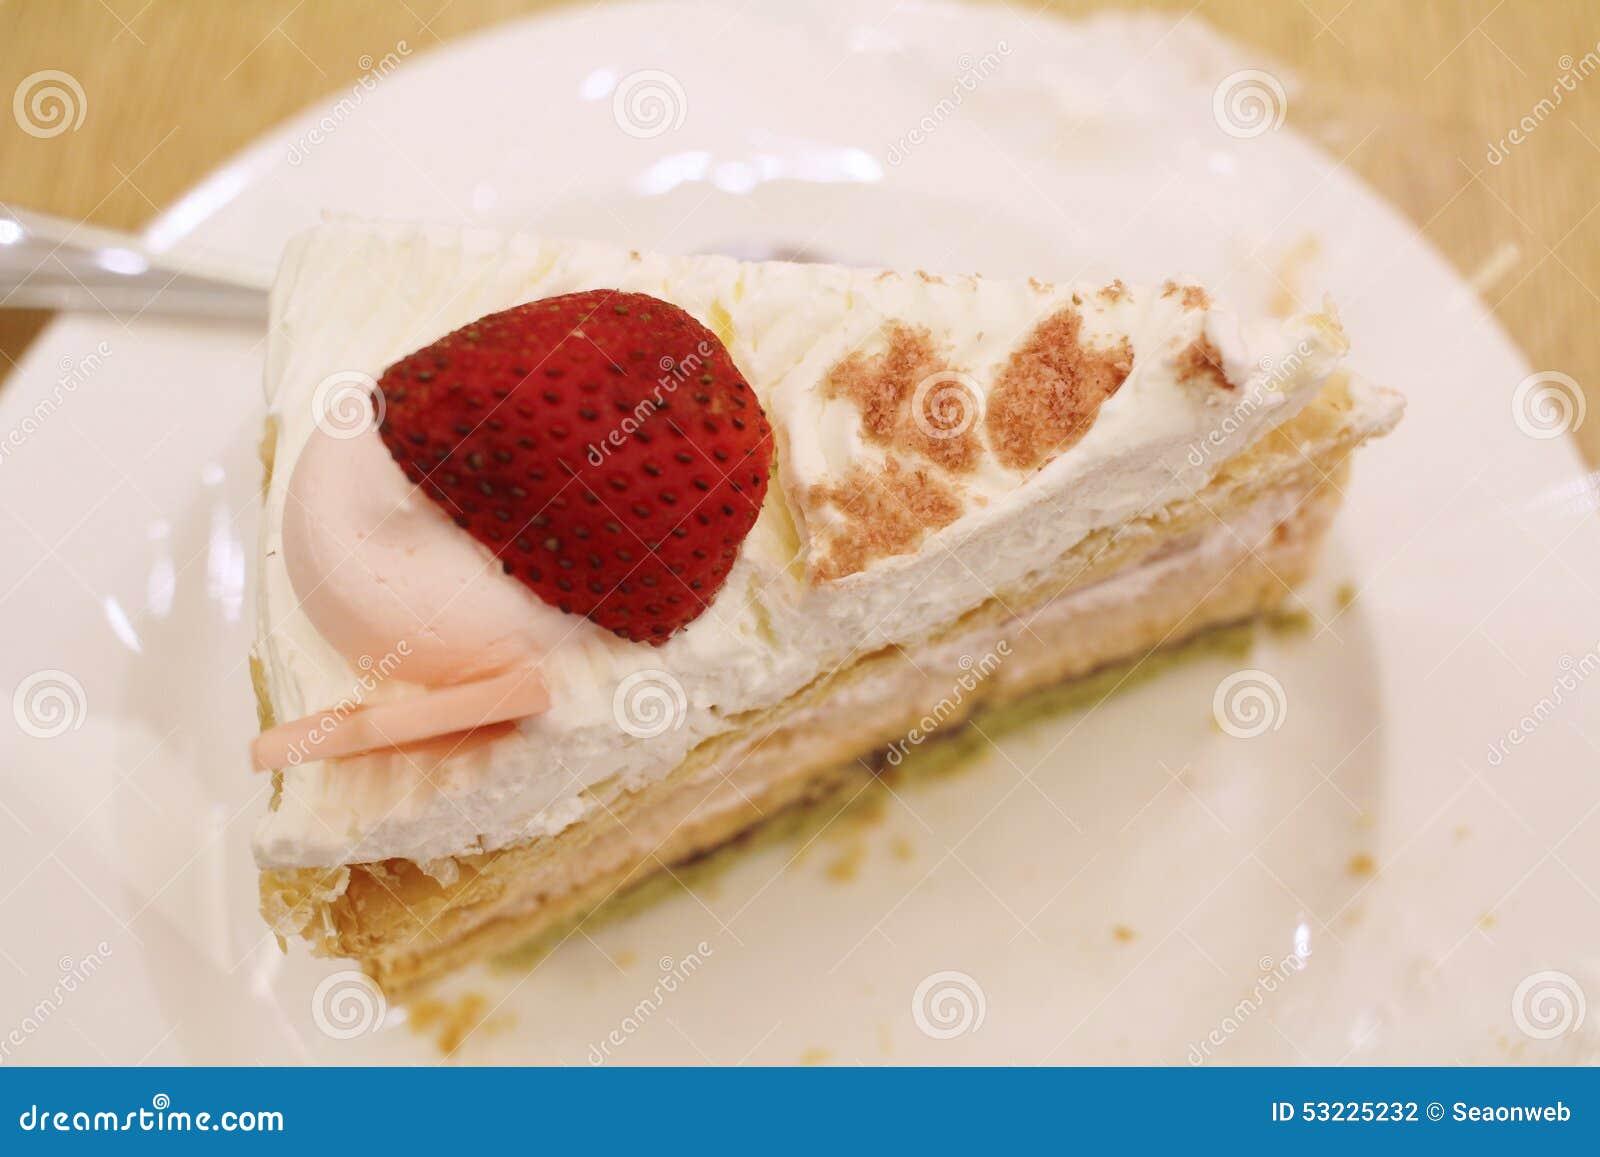 Rebanada de torta de la fresa en una placa blanca